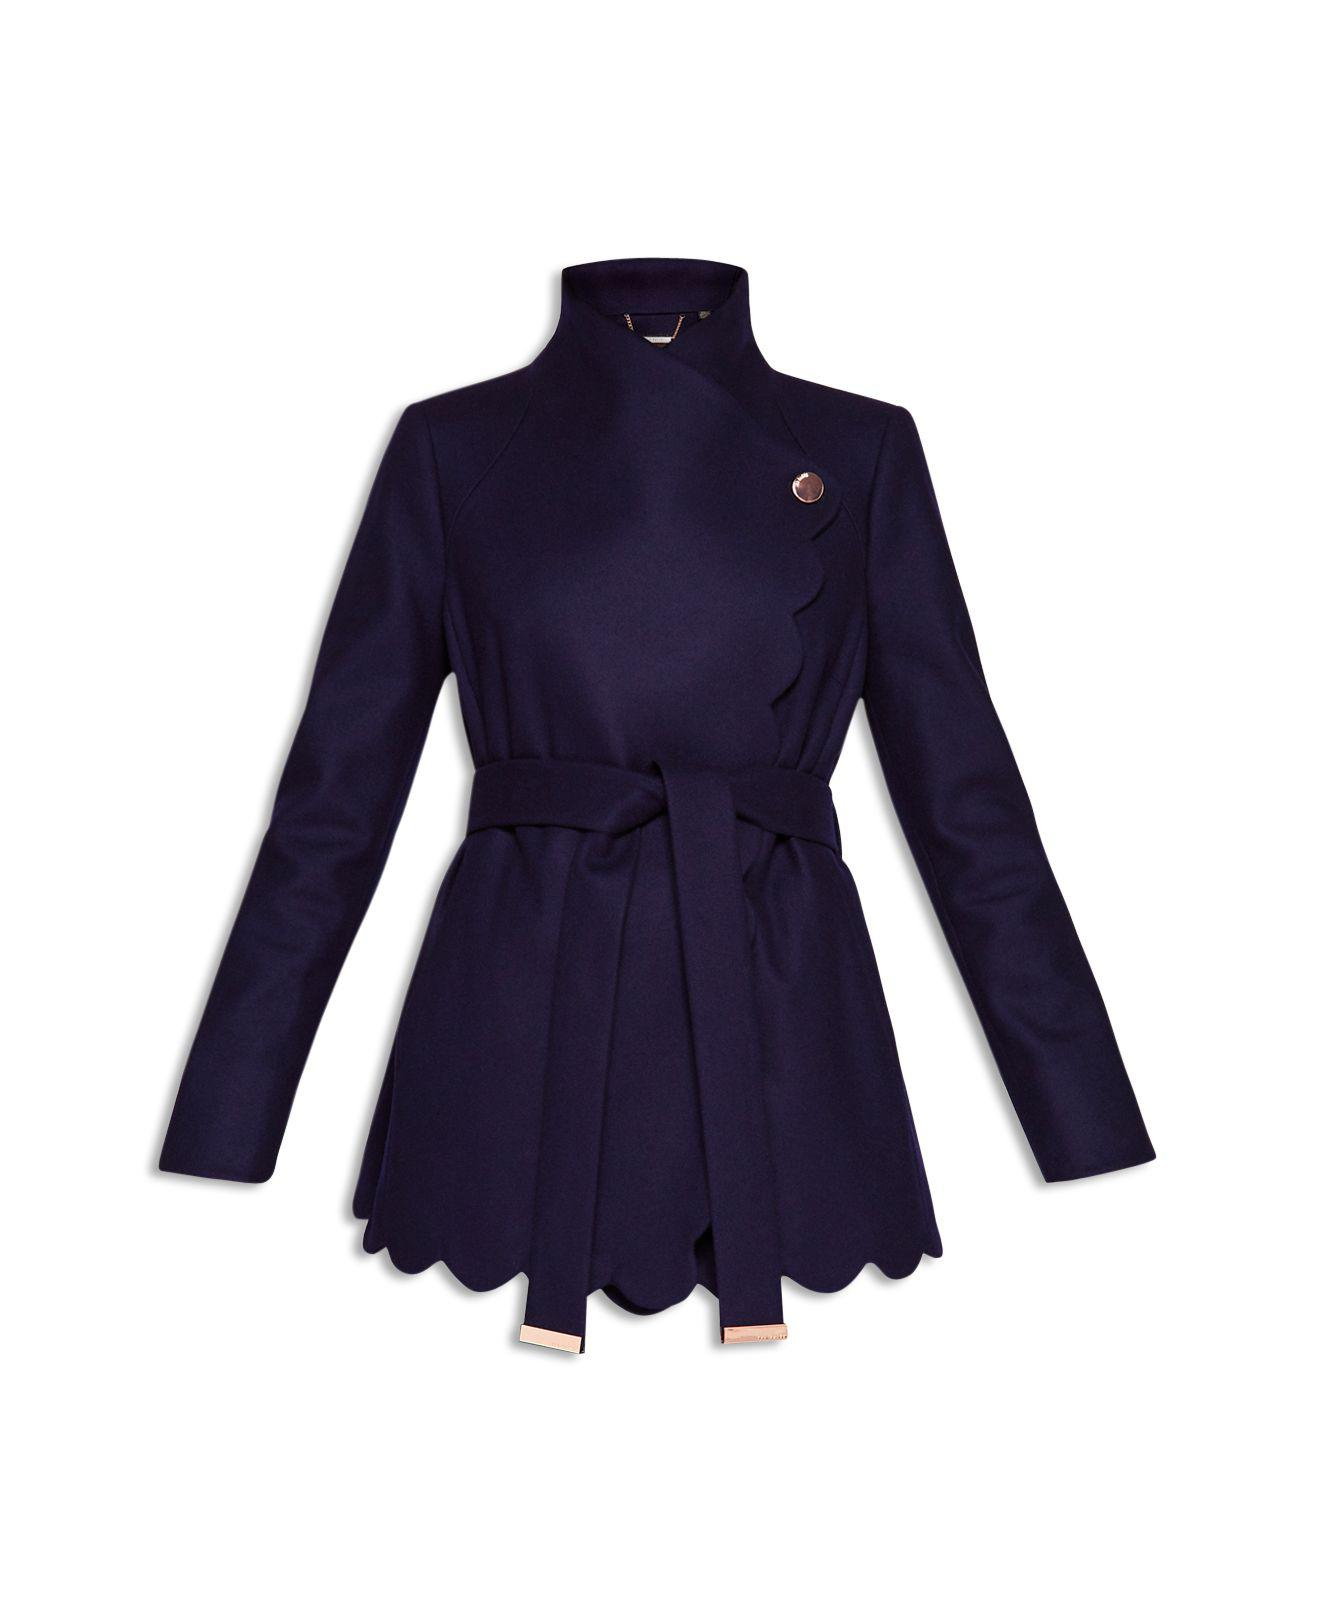 76cd607e5 Lyst - Ted Baker Aastar Scallop Edge Short Wrap Coat in Blue